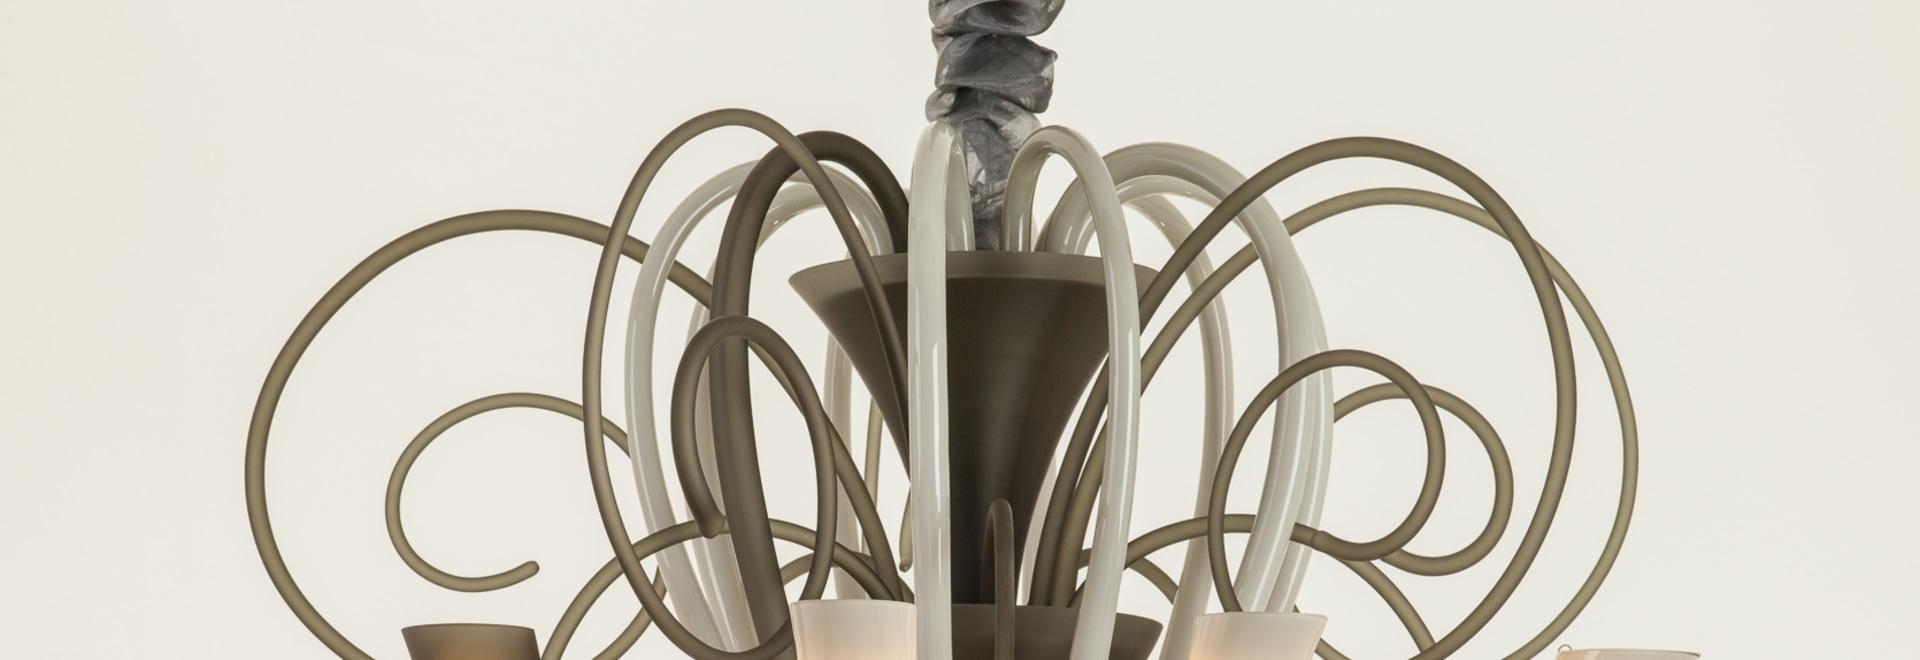 Carlesso_New Finish for GODO chandelier